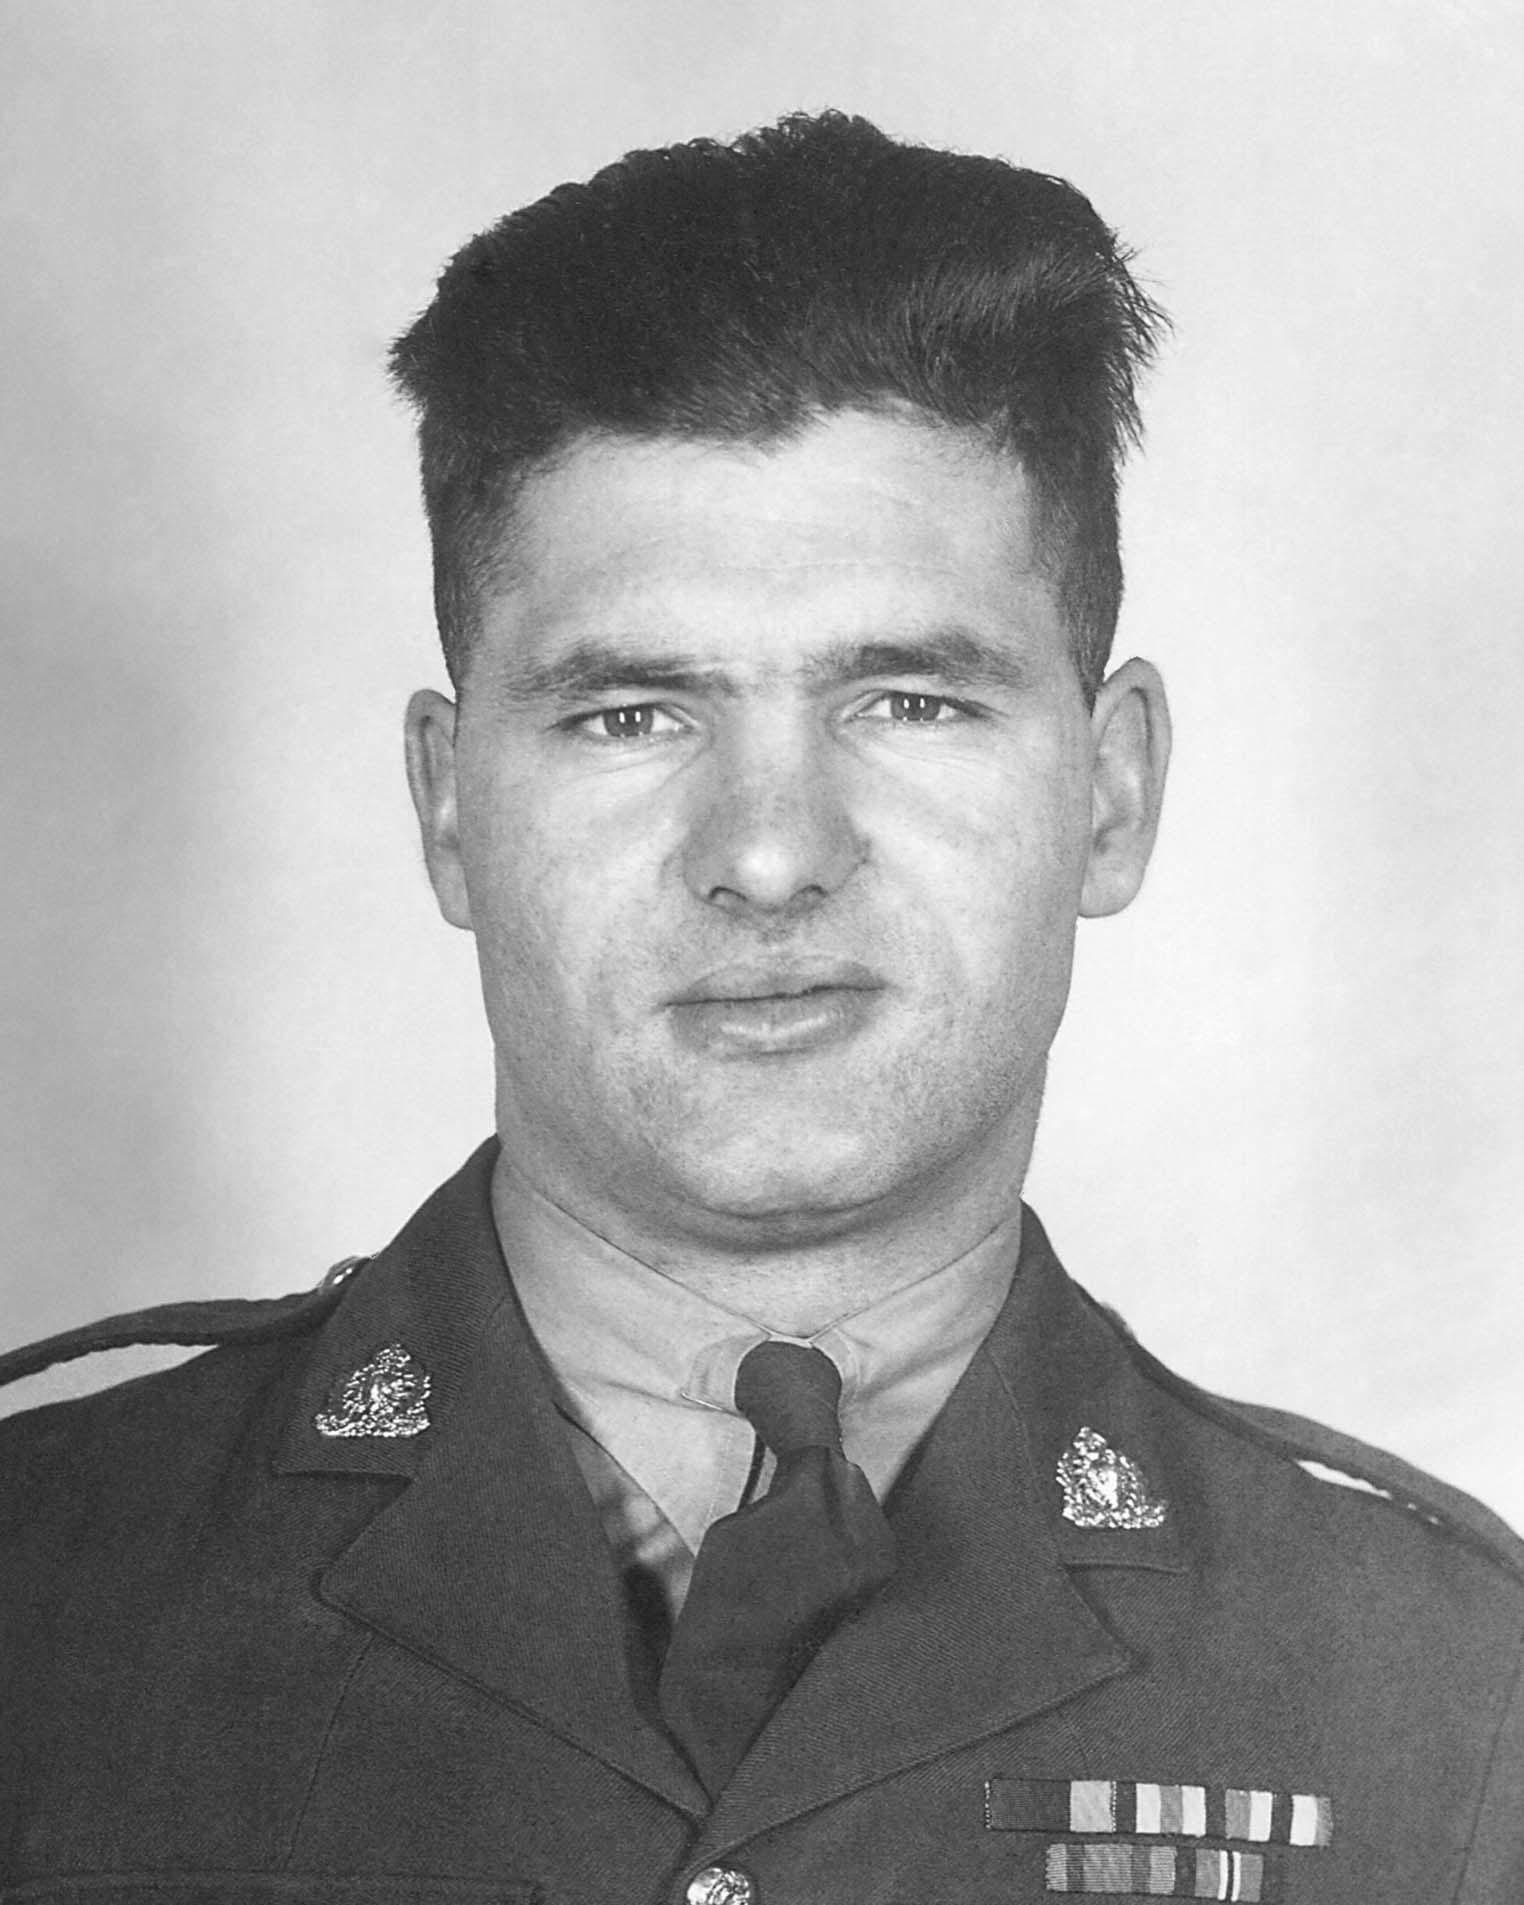 Gendarme Roy Eldon Laird